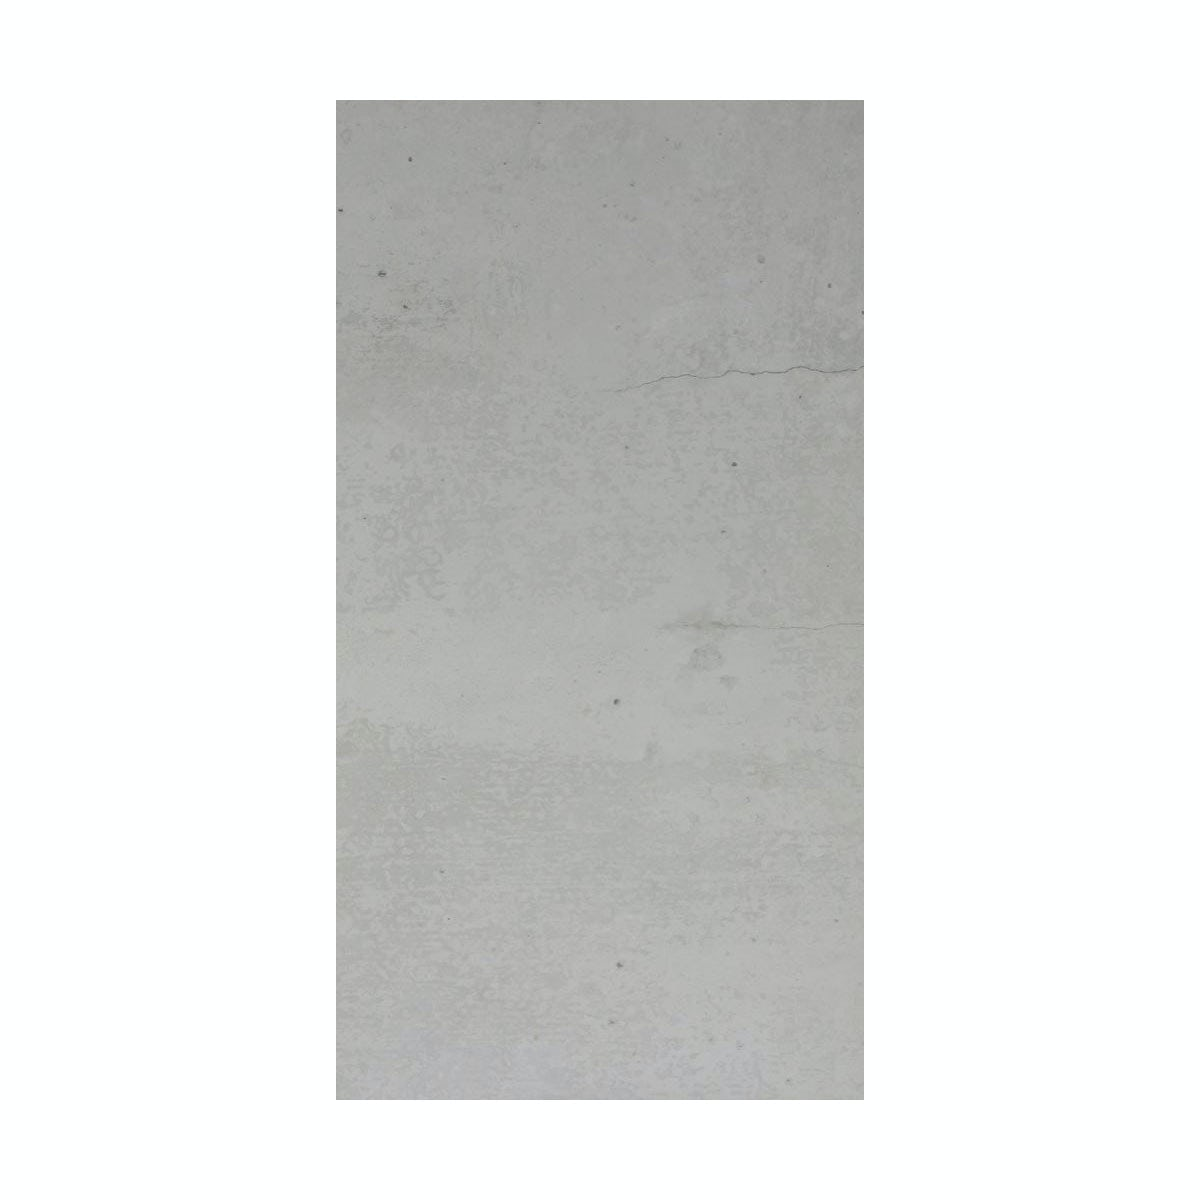 British ceramic tile metropolis light grey matt tile 248mm x 498mm british ceramic tile metropolis light grey matt tile 248mm x 498mm dailygadgetfo Gallery